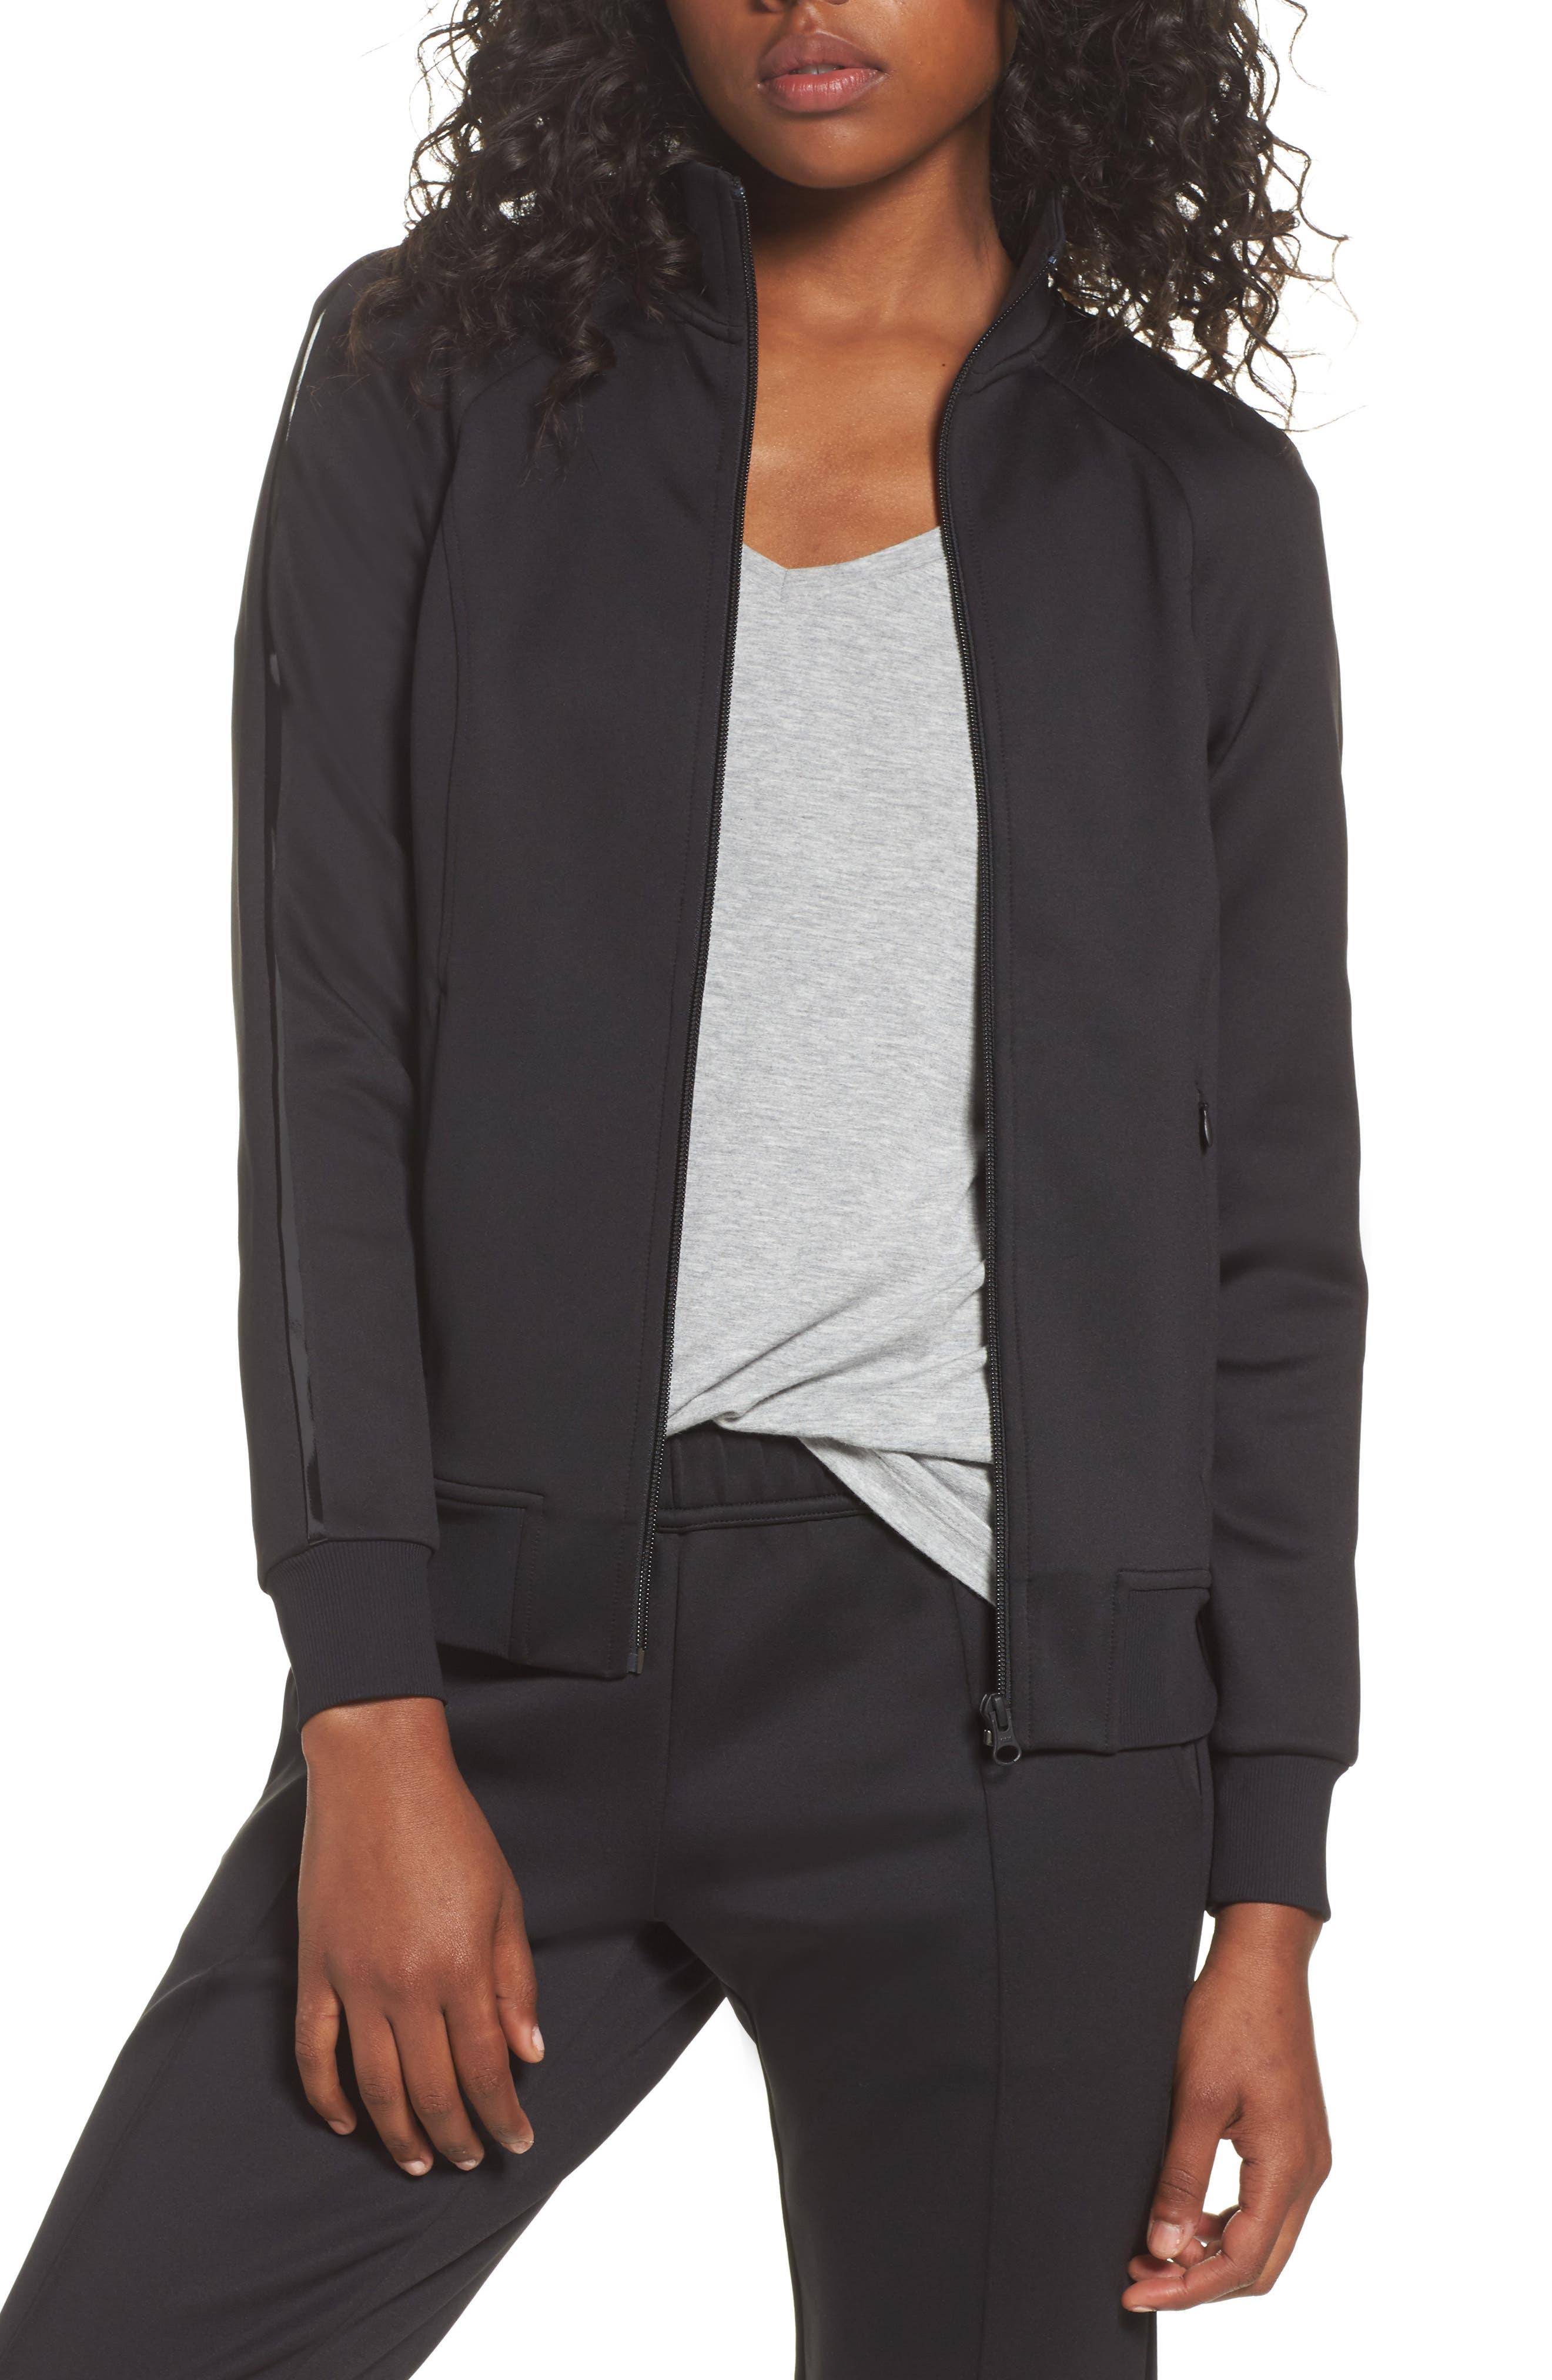 Main Image - Zella Street Chic Jacket